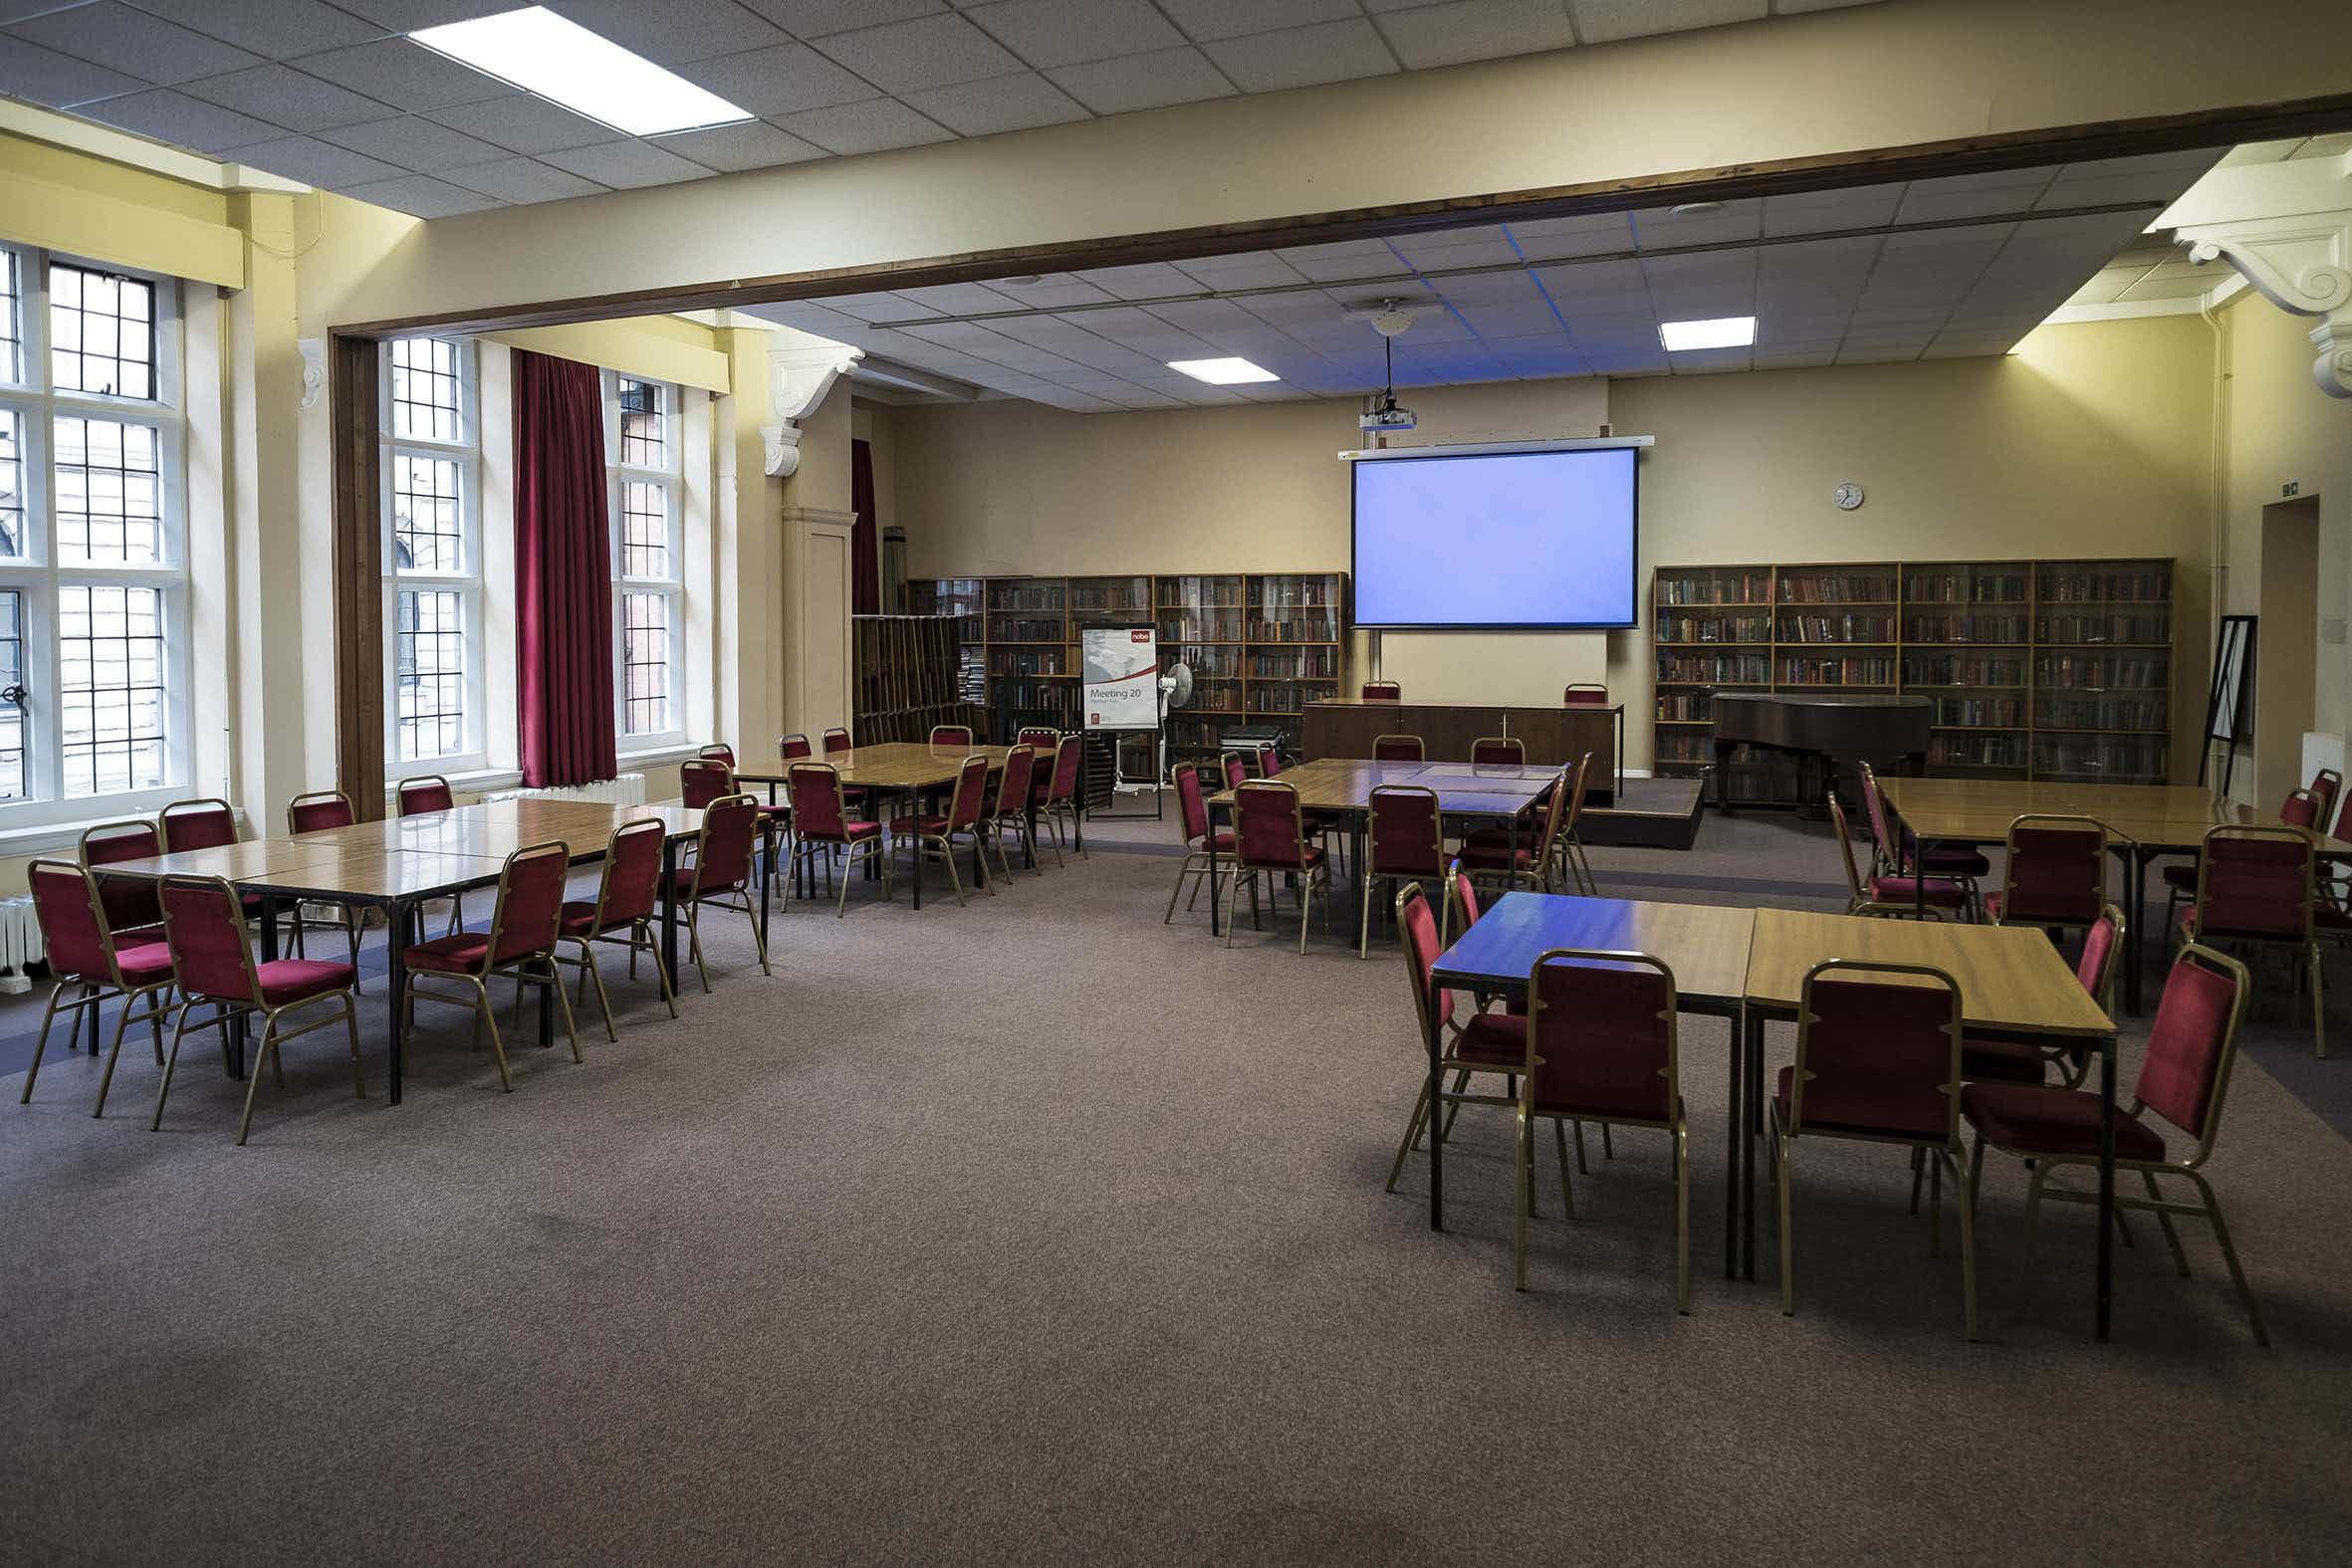 Dickens Room, The Birmingham and Midland Institute